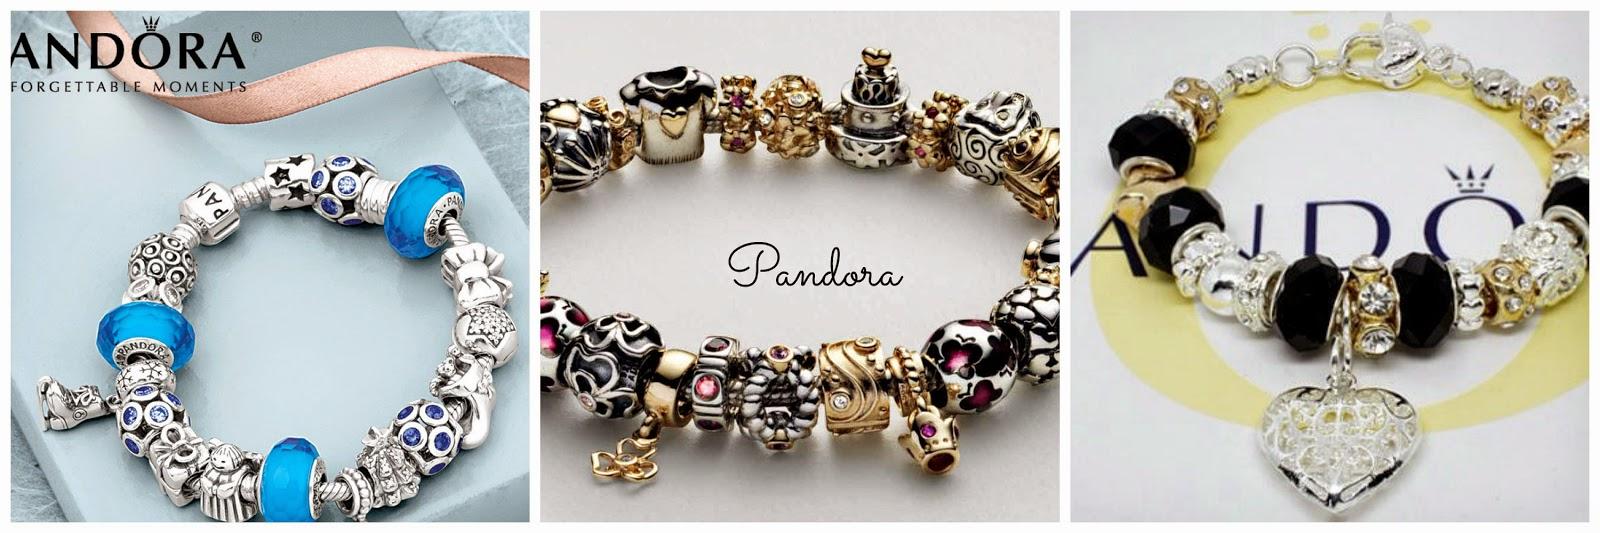 Gelang Pandora Habib Jewels